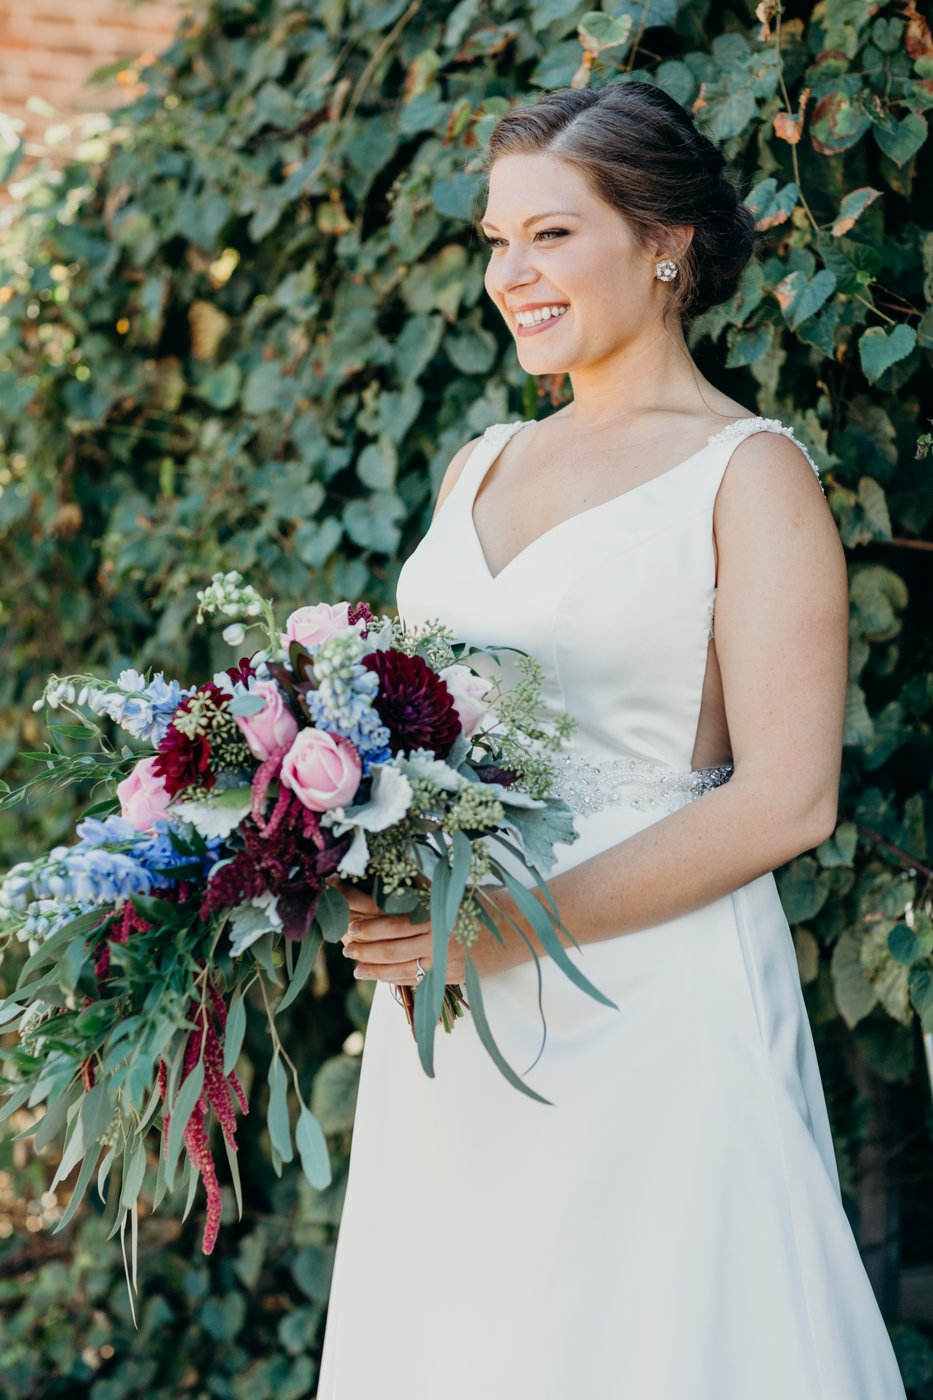 Ryan Jessica-Bride Groom-0036.jpg